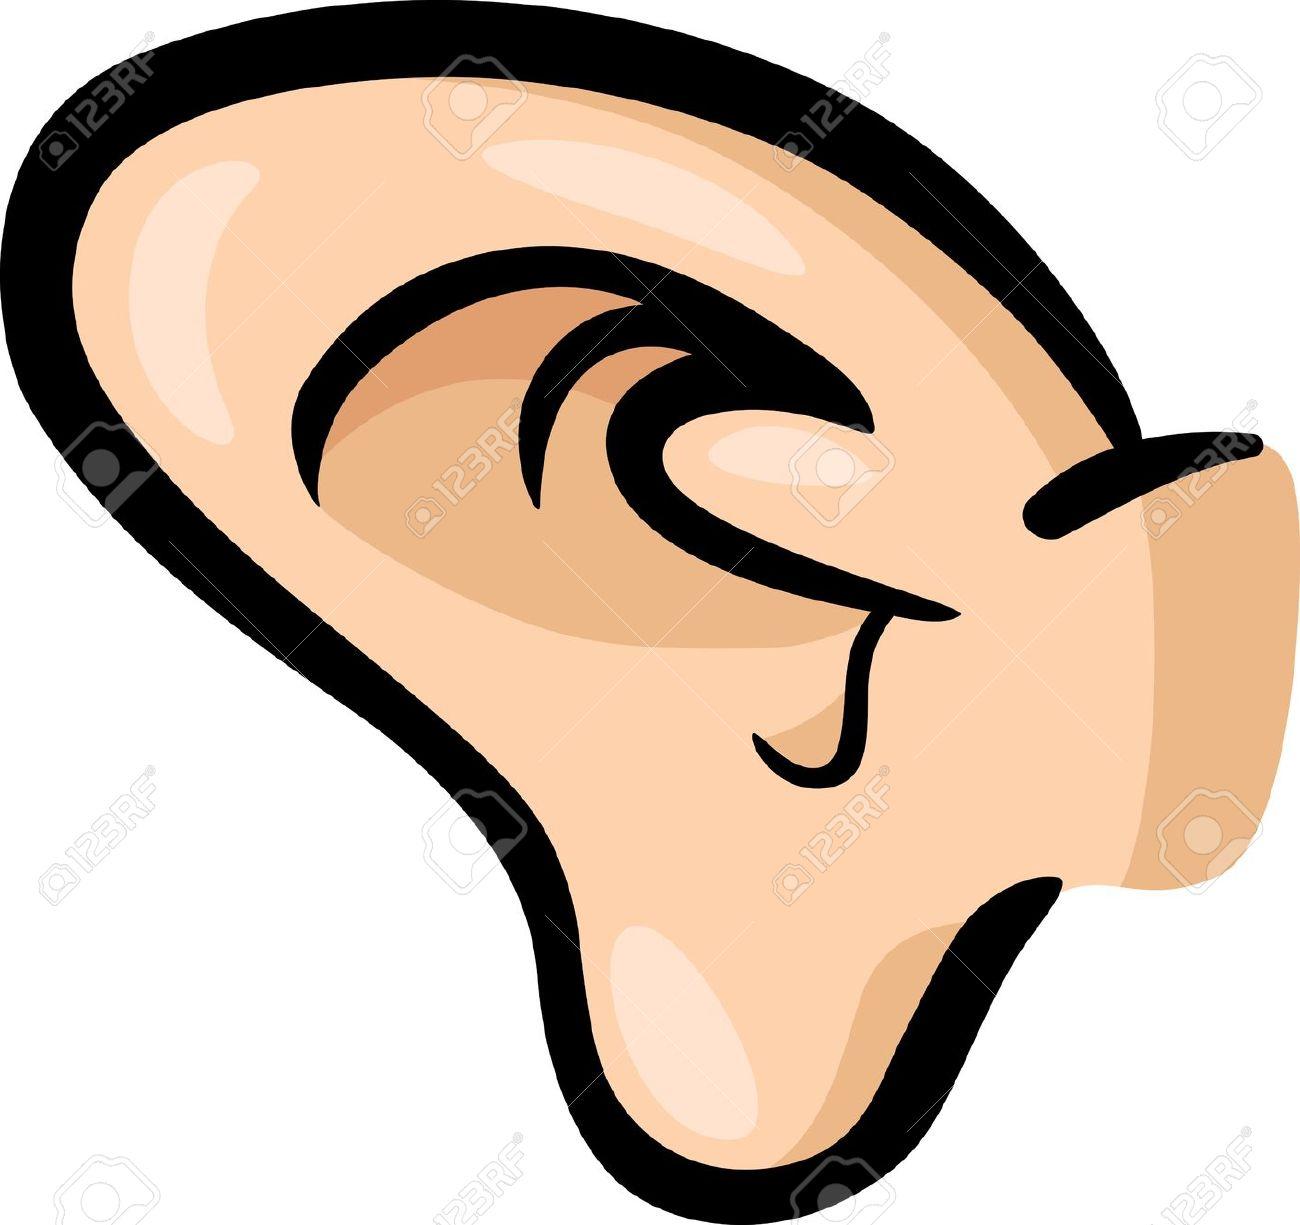 Cartoon big ear clipart image royalty free stock Cartoon big ear clipart - ClipartFest image royalty free stock